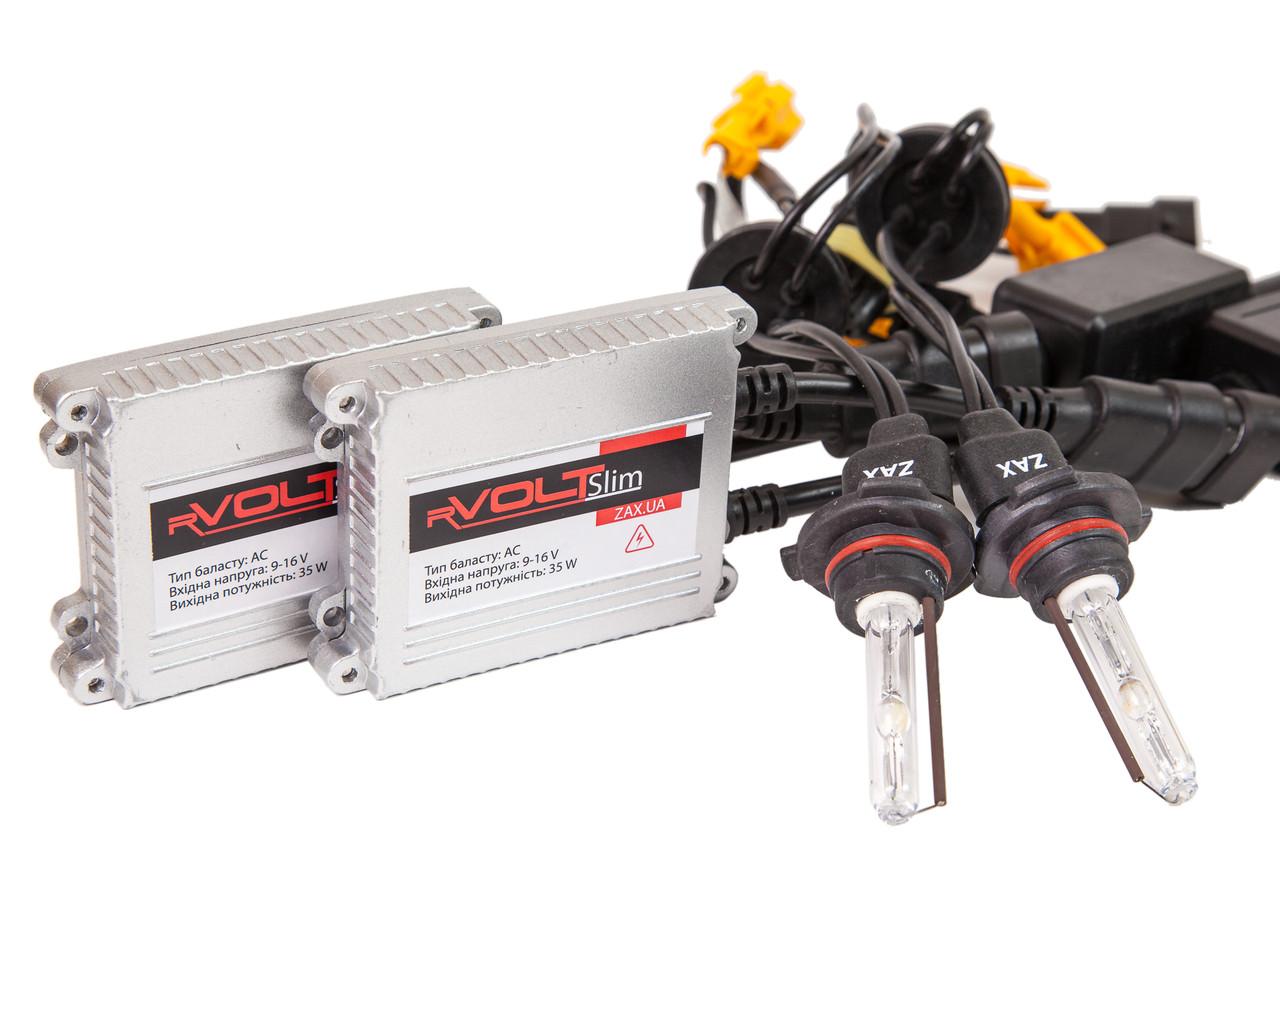 Комплект ксенона rVolt slim 35W 9-16V Zax ceramic HB3 (9005) 3000K